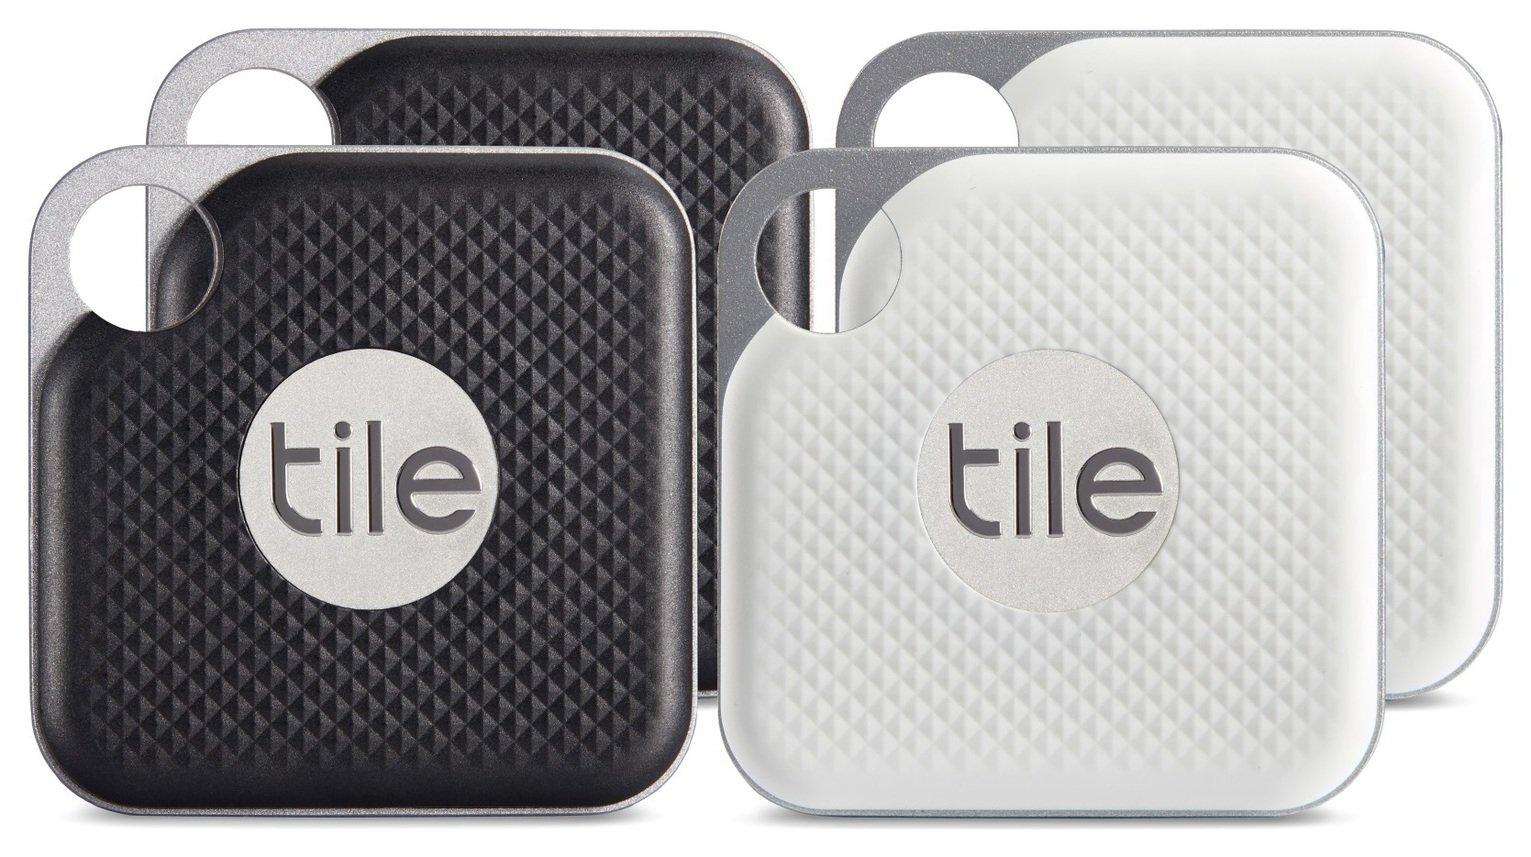 Tile Pro 2018 Key and Item Finder Combo - 4 Pack